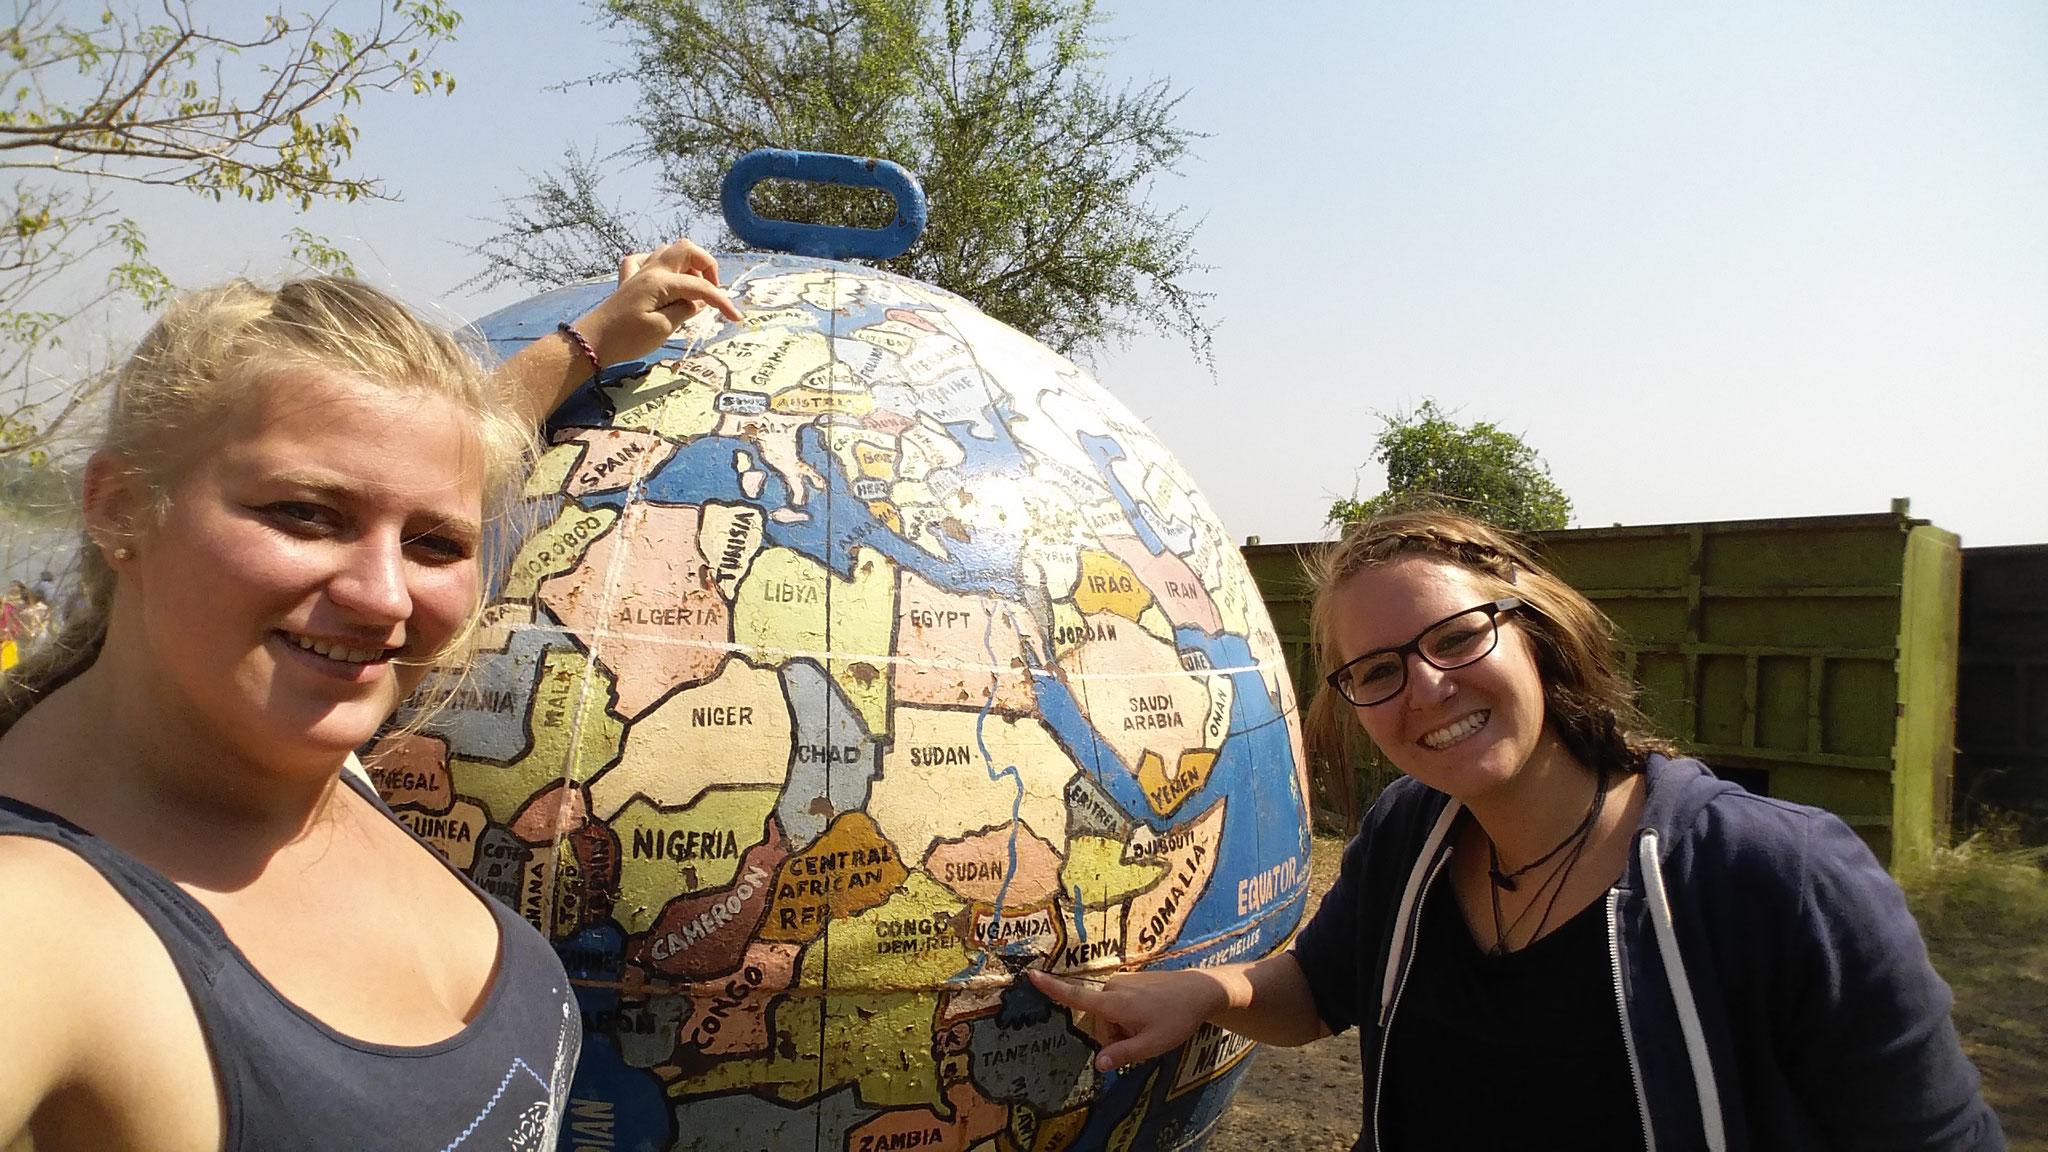 Germany meets Uganda